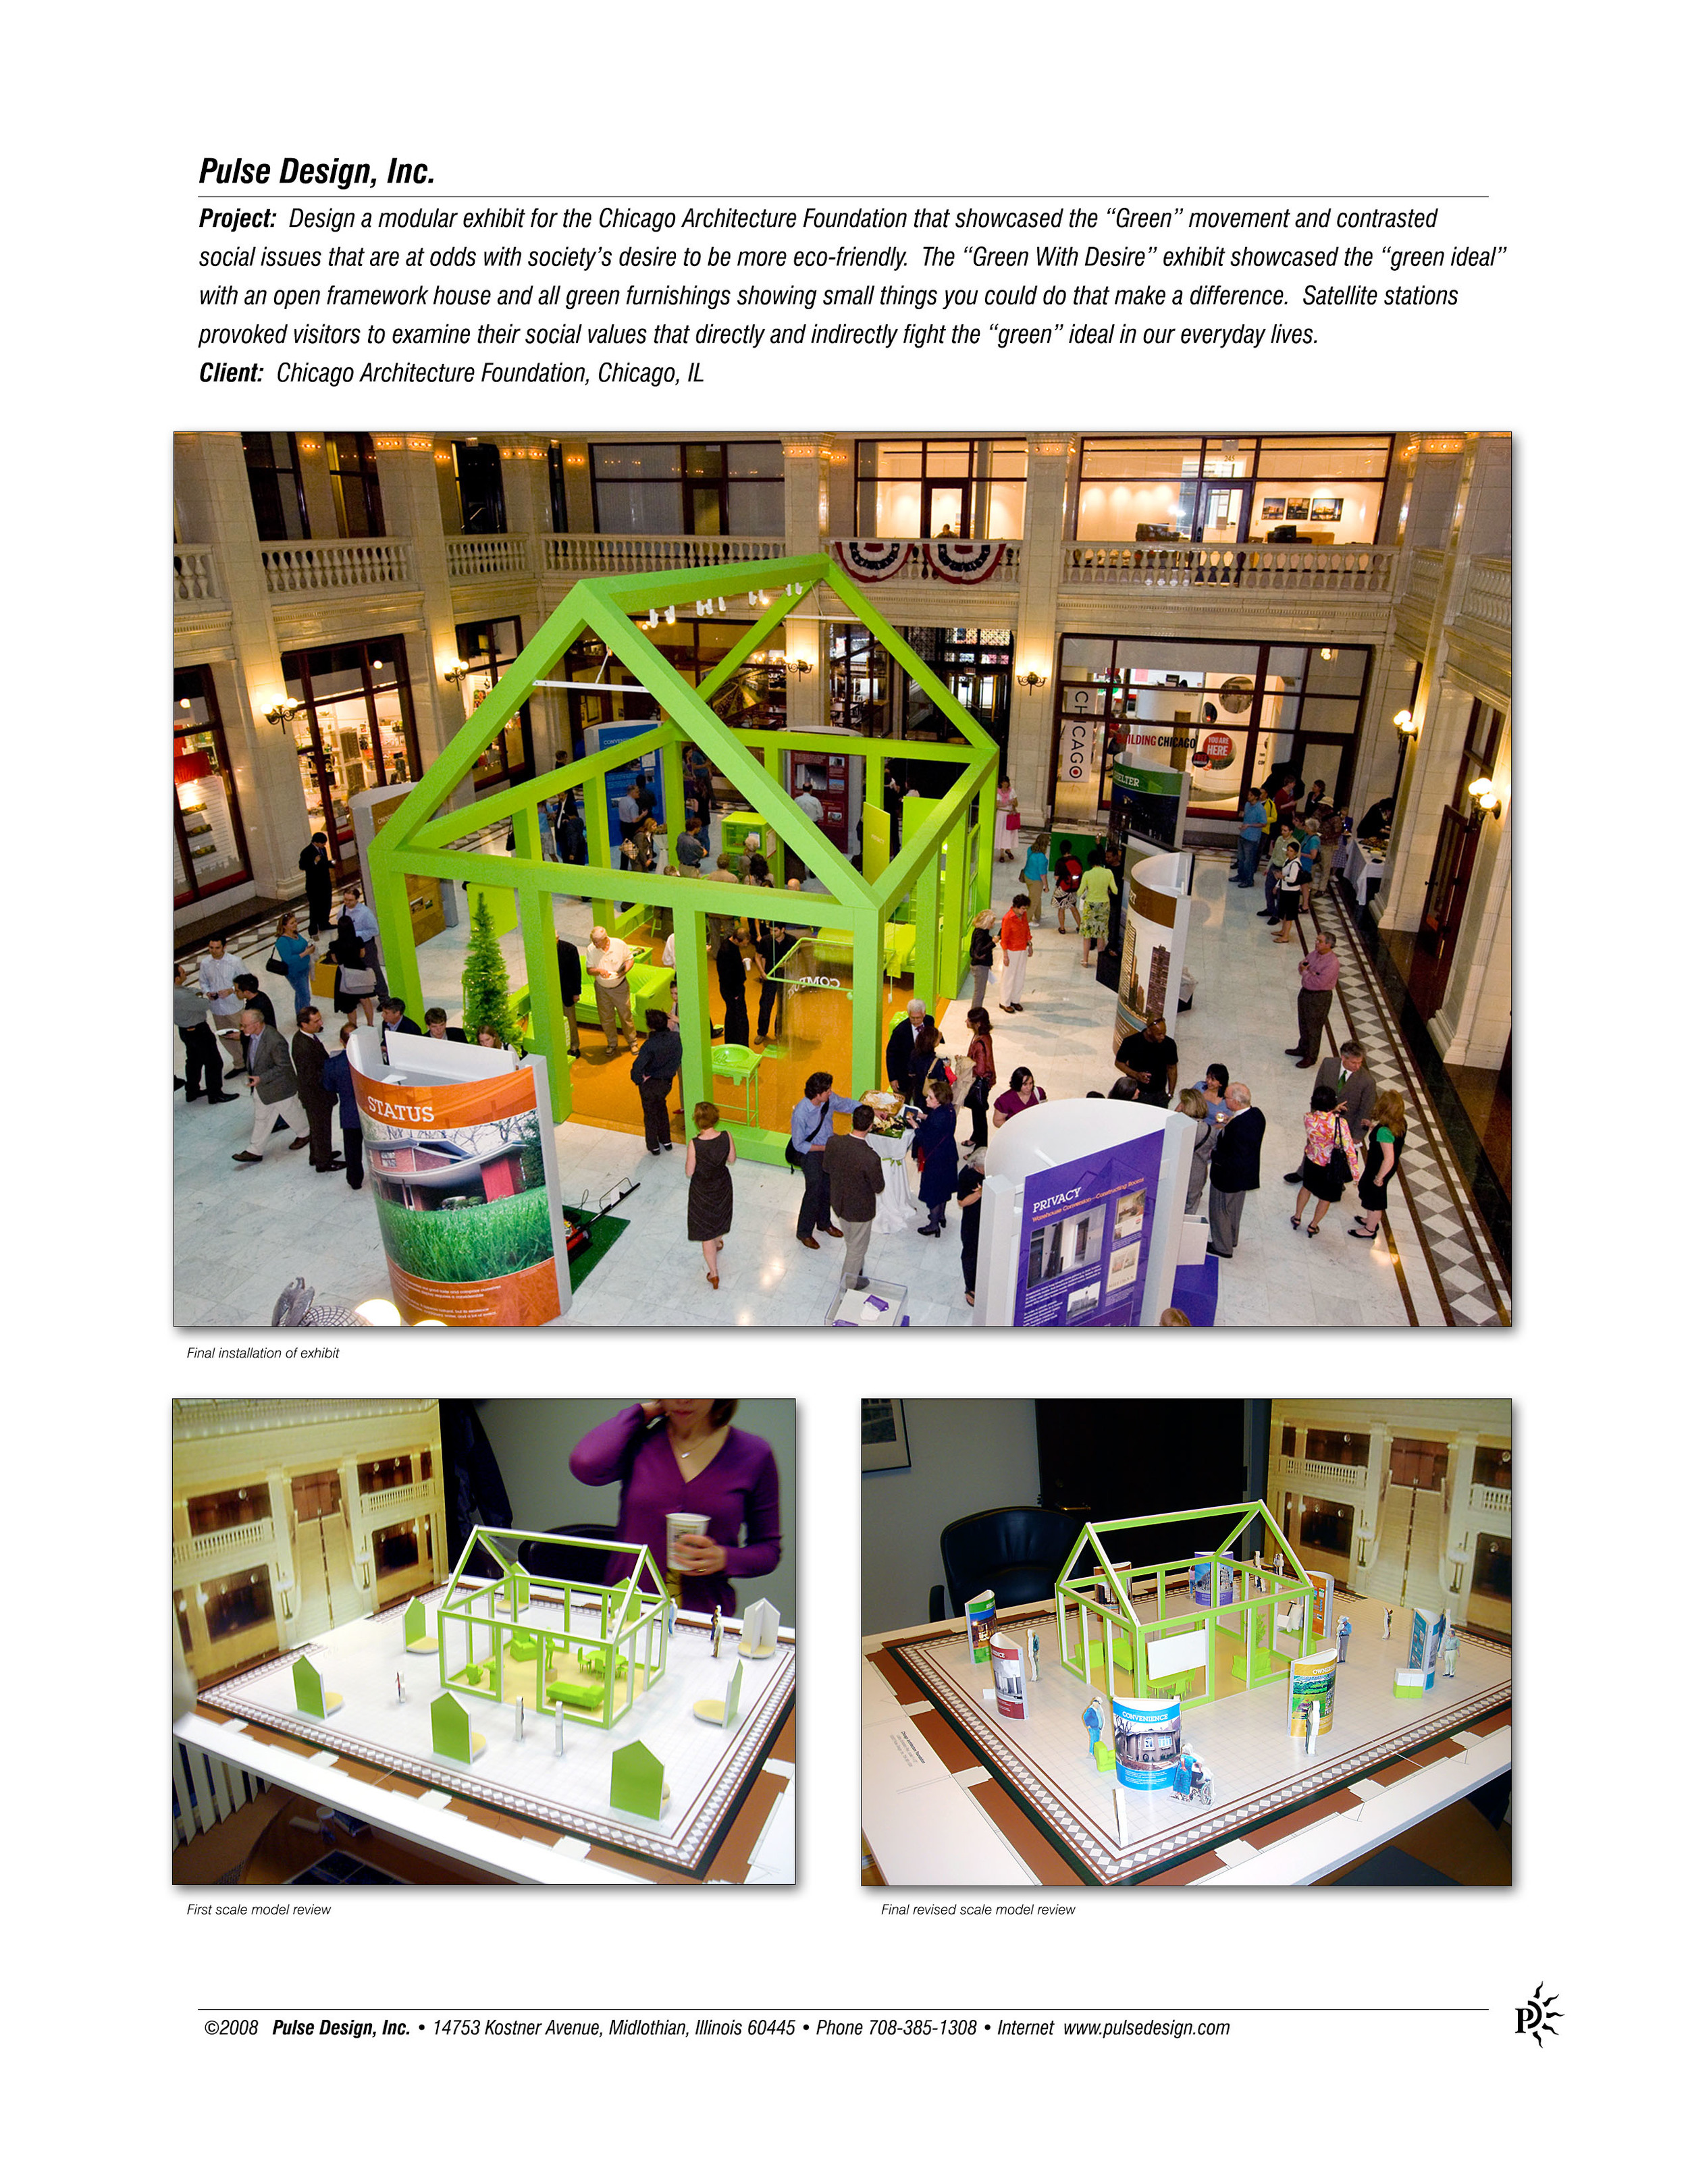 CAF-Green-With-Desire-Exhibit-1-Pulse-Design-Inc.jpg